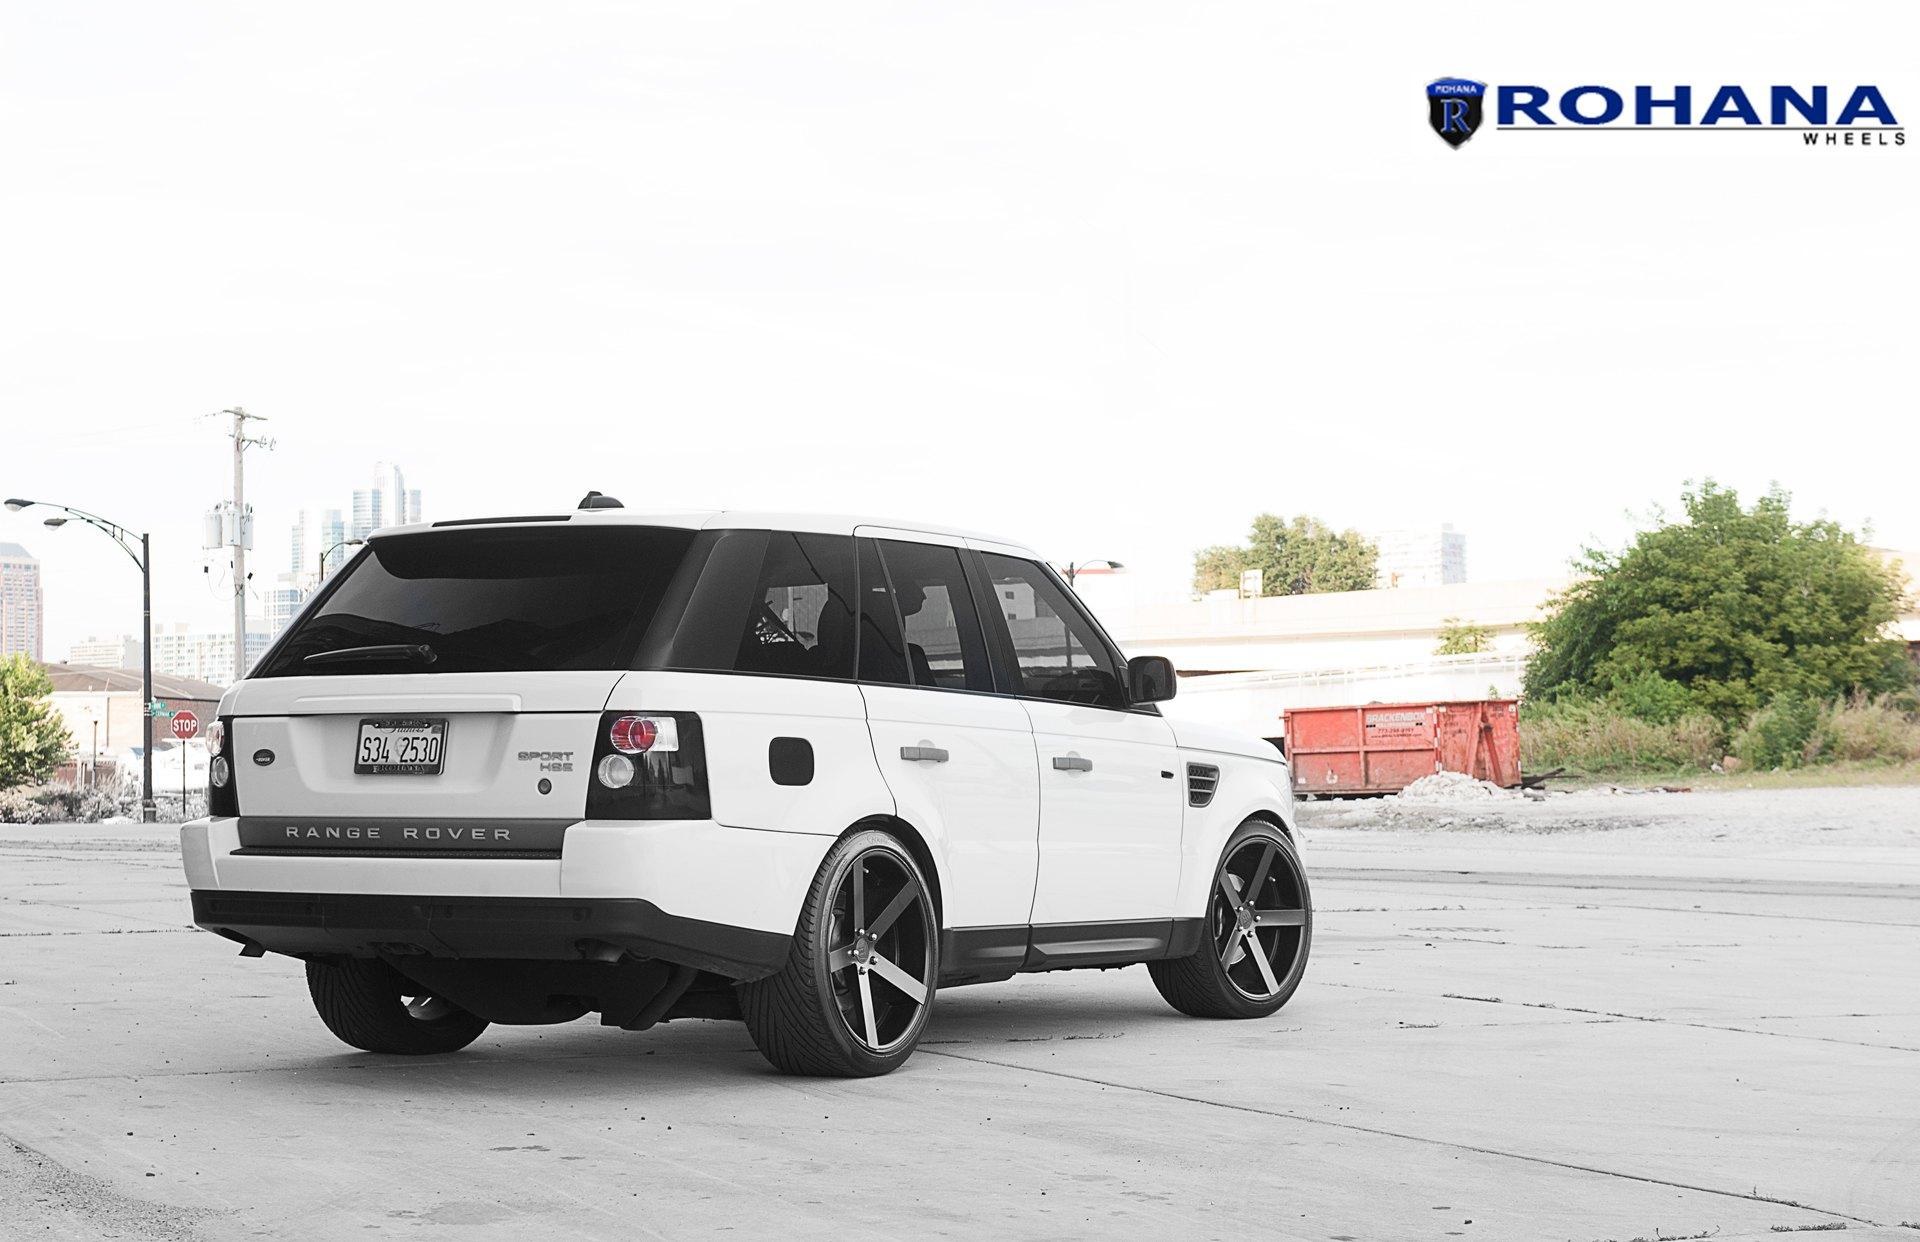 Range Rover Sport Hse On Rohana Rc22 Custom Wheels Carid Com Gallery